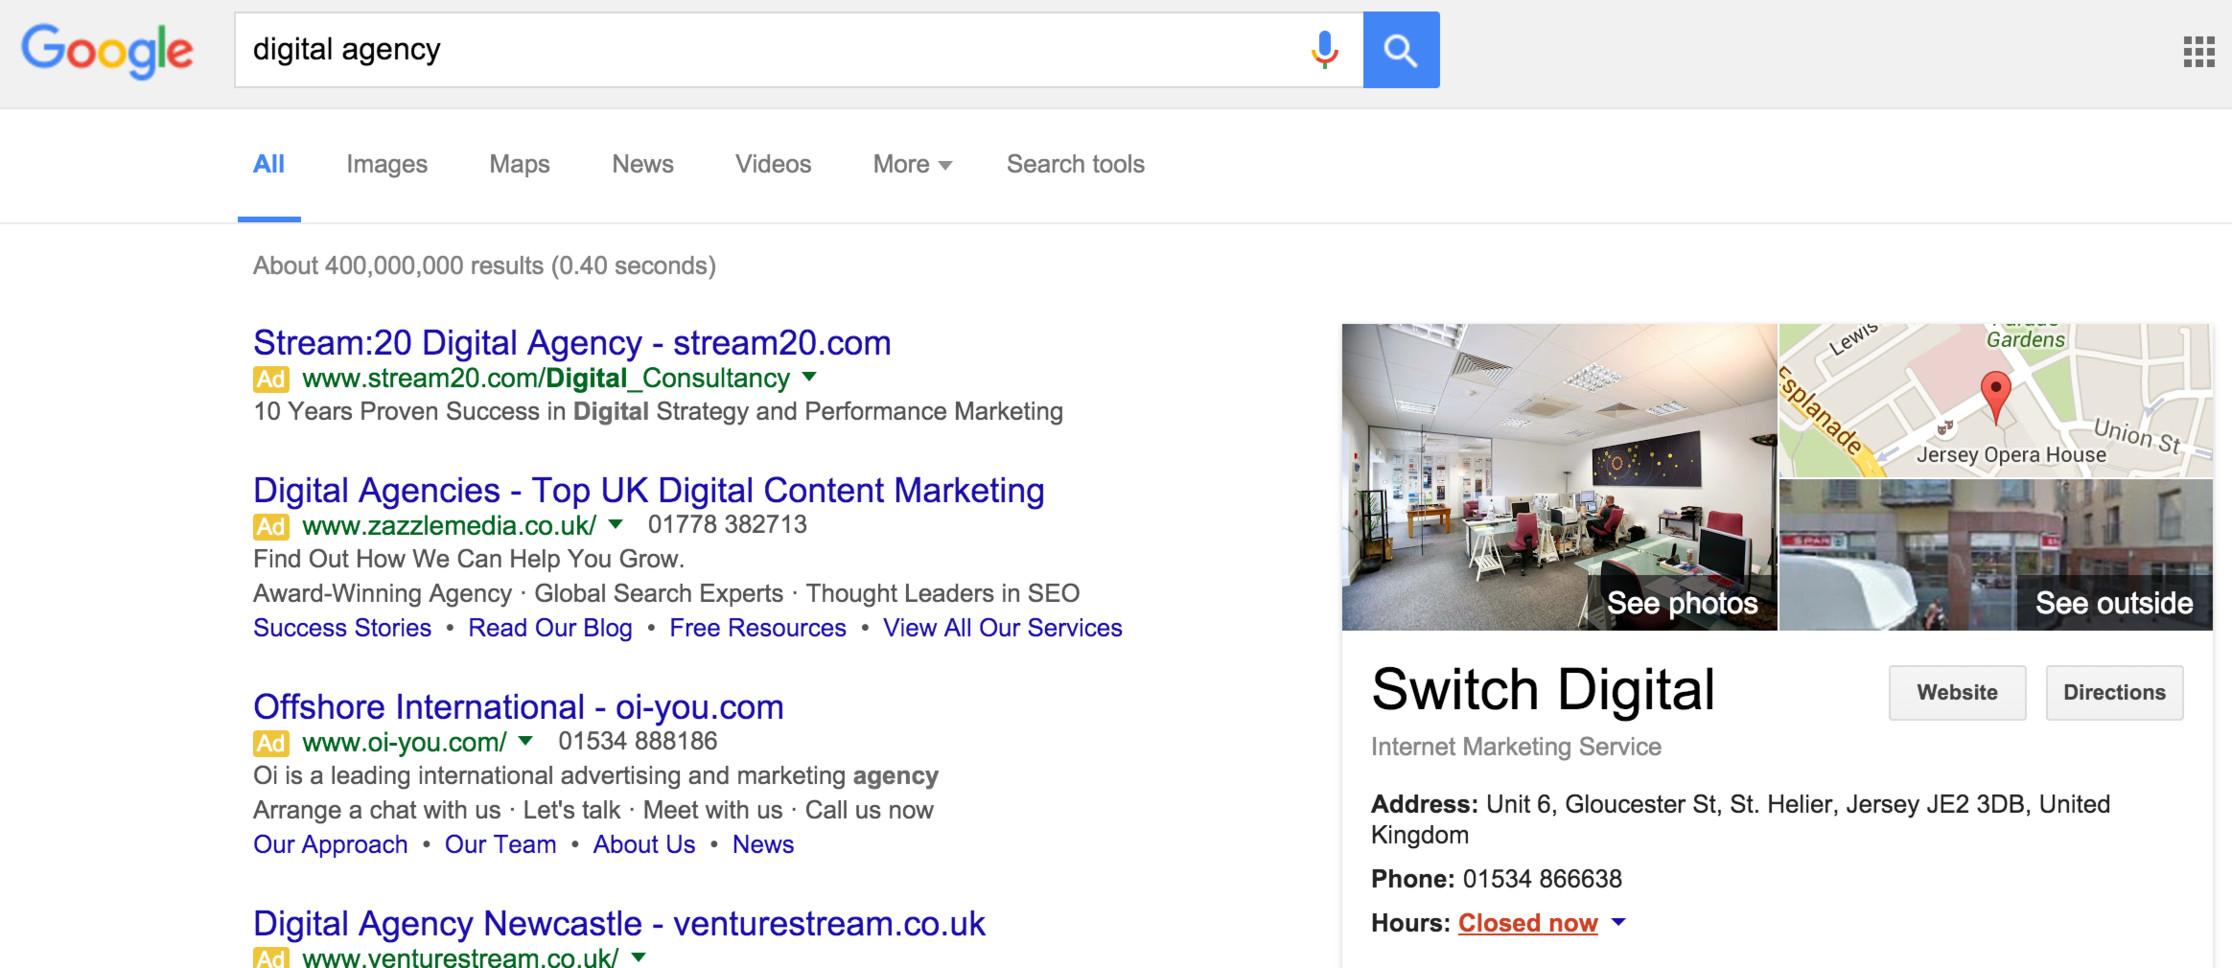 Switch digital agency on google.je